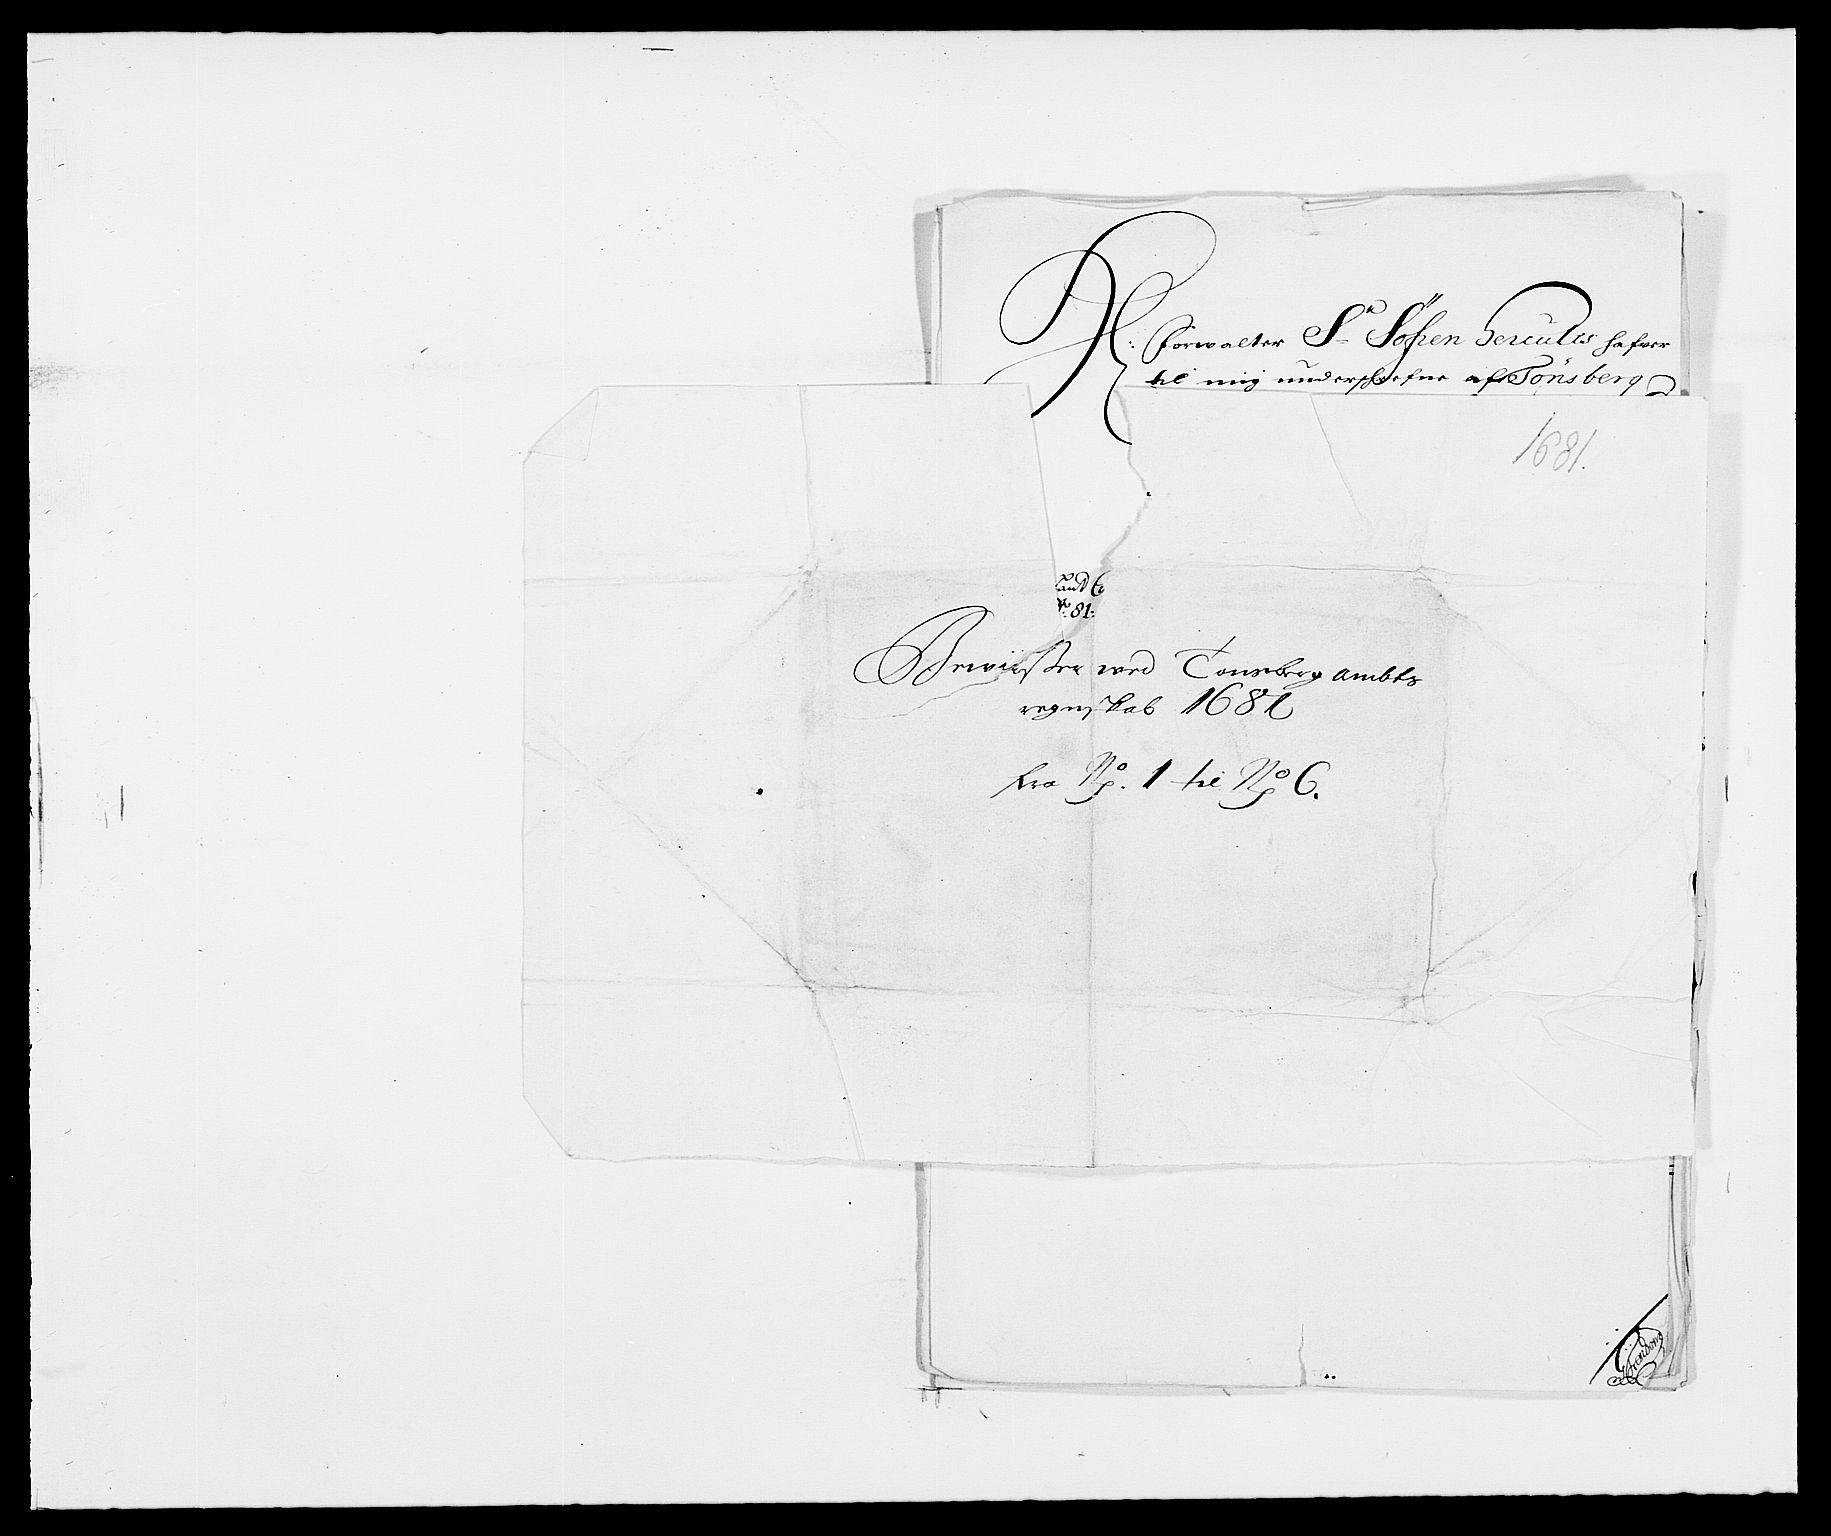 RA, Rentekammeret inntil 1814, Reviderte regnskaper, Fogderegnskap, R32/L1850: Fogderegnskap Jarlsberg grevskap, 1681, s. 304